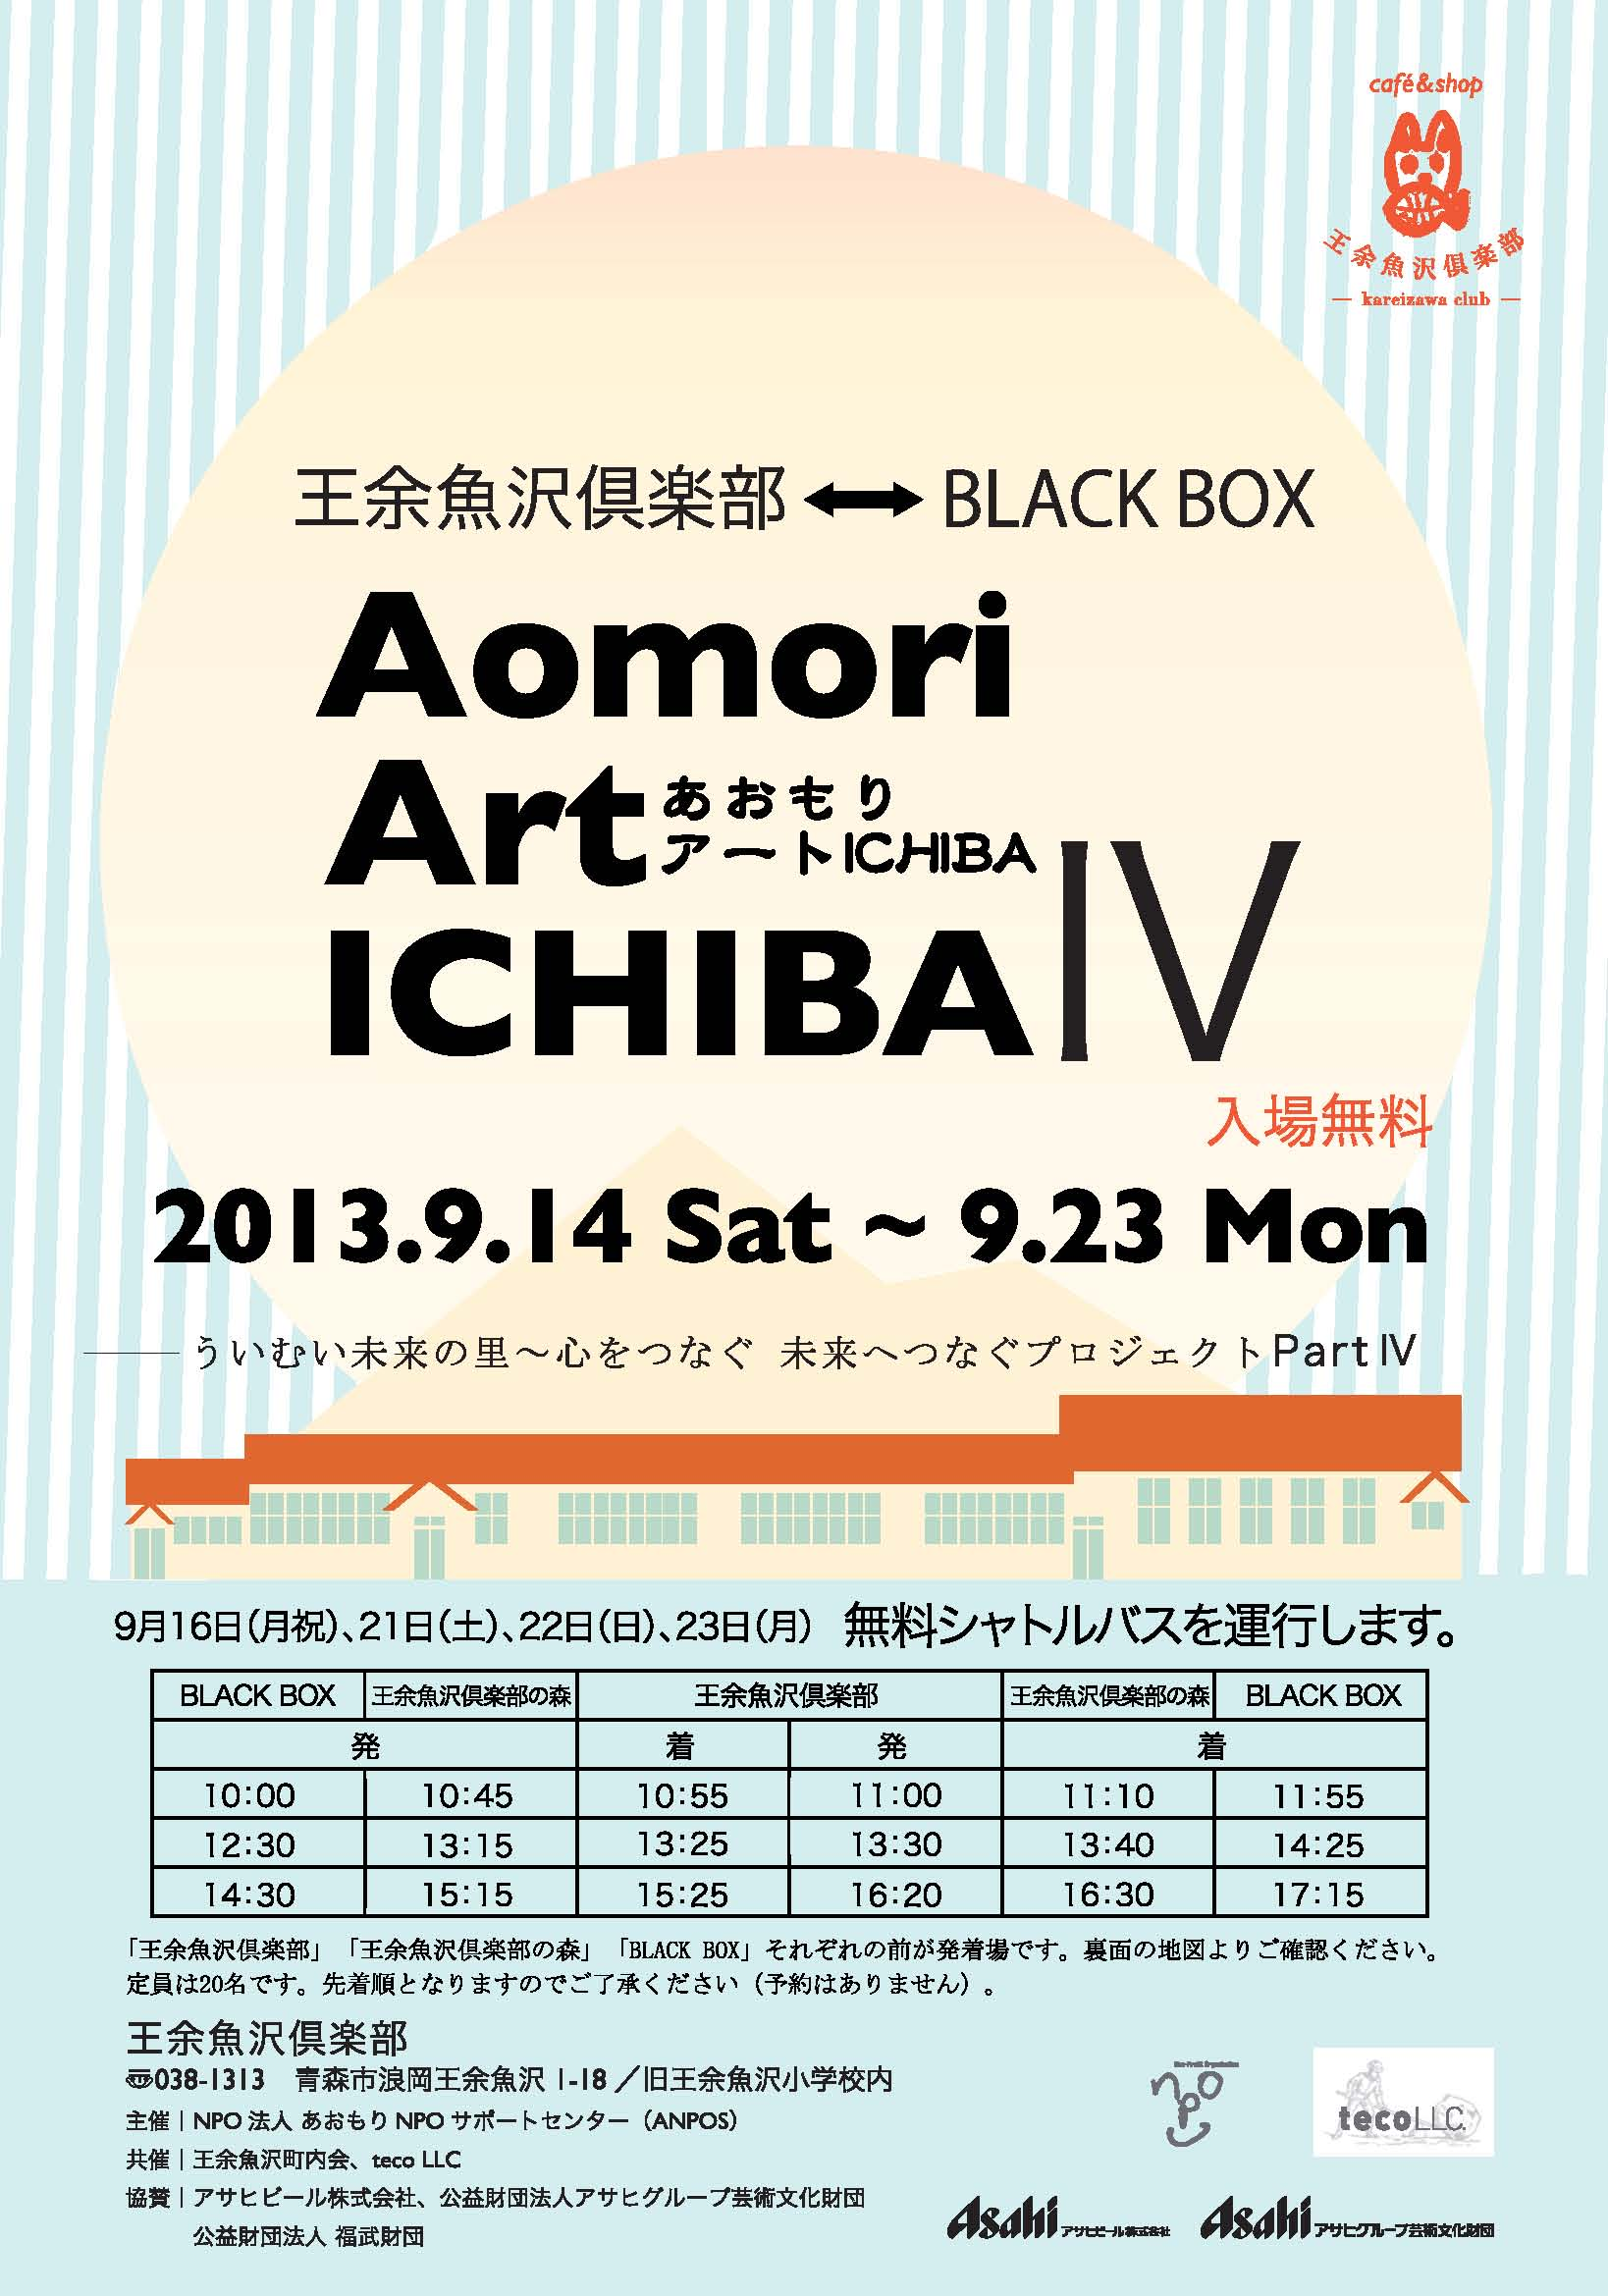 <!--:ja-->あおもりアートICHIBA開催!9/14〜9/23<!--:-->